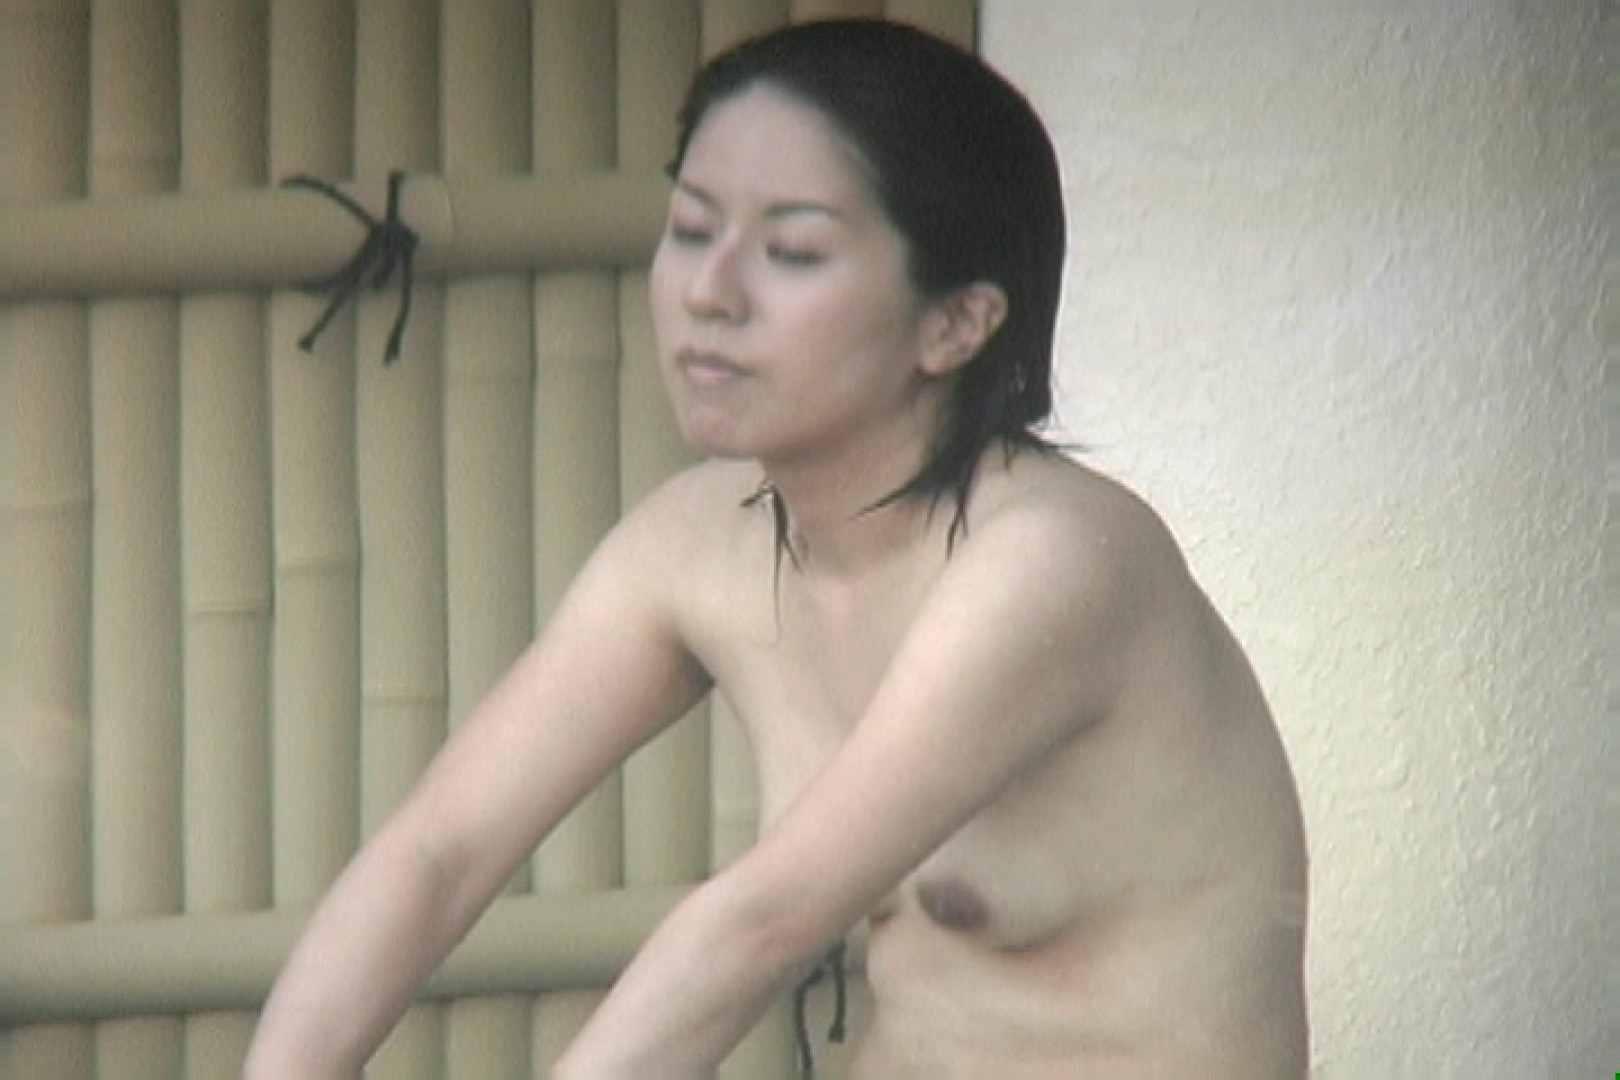 Aquaな露天風呂Vol.694 露天 オメコ無修正動画無料 110PICs 14